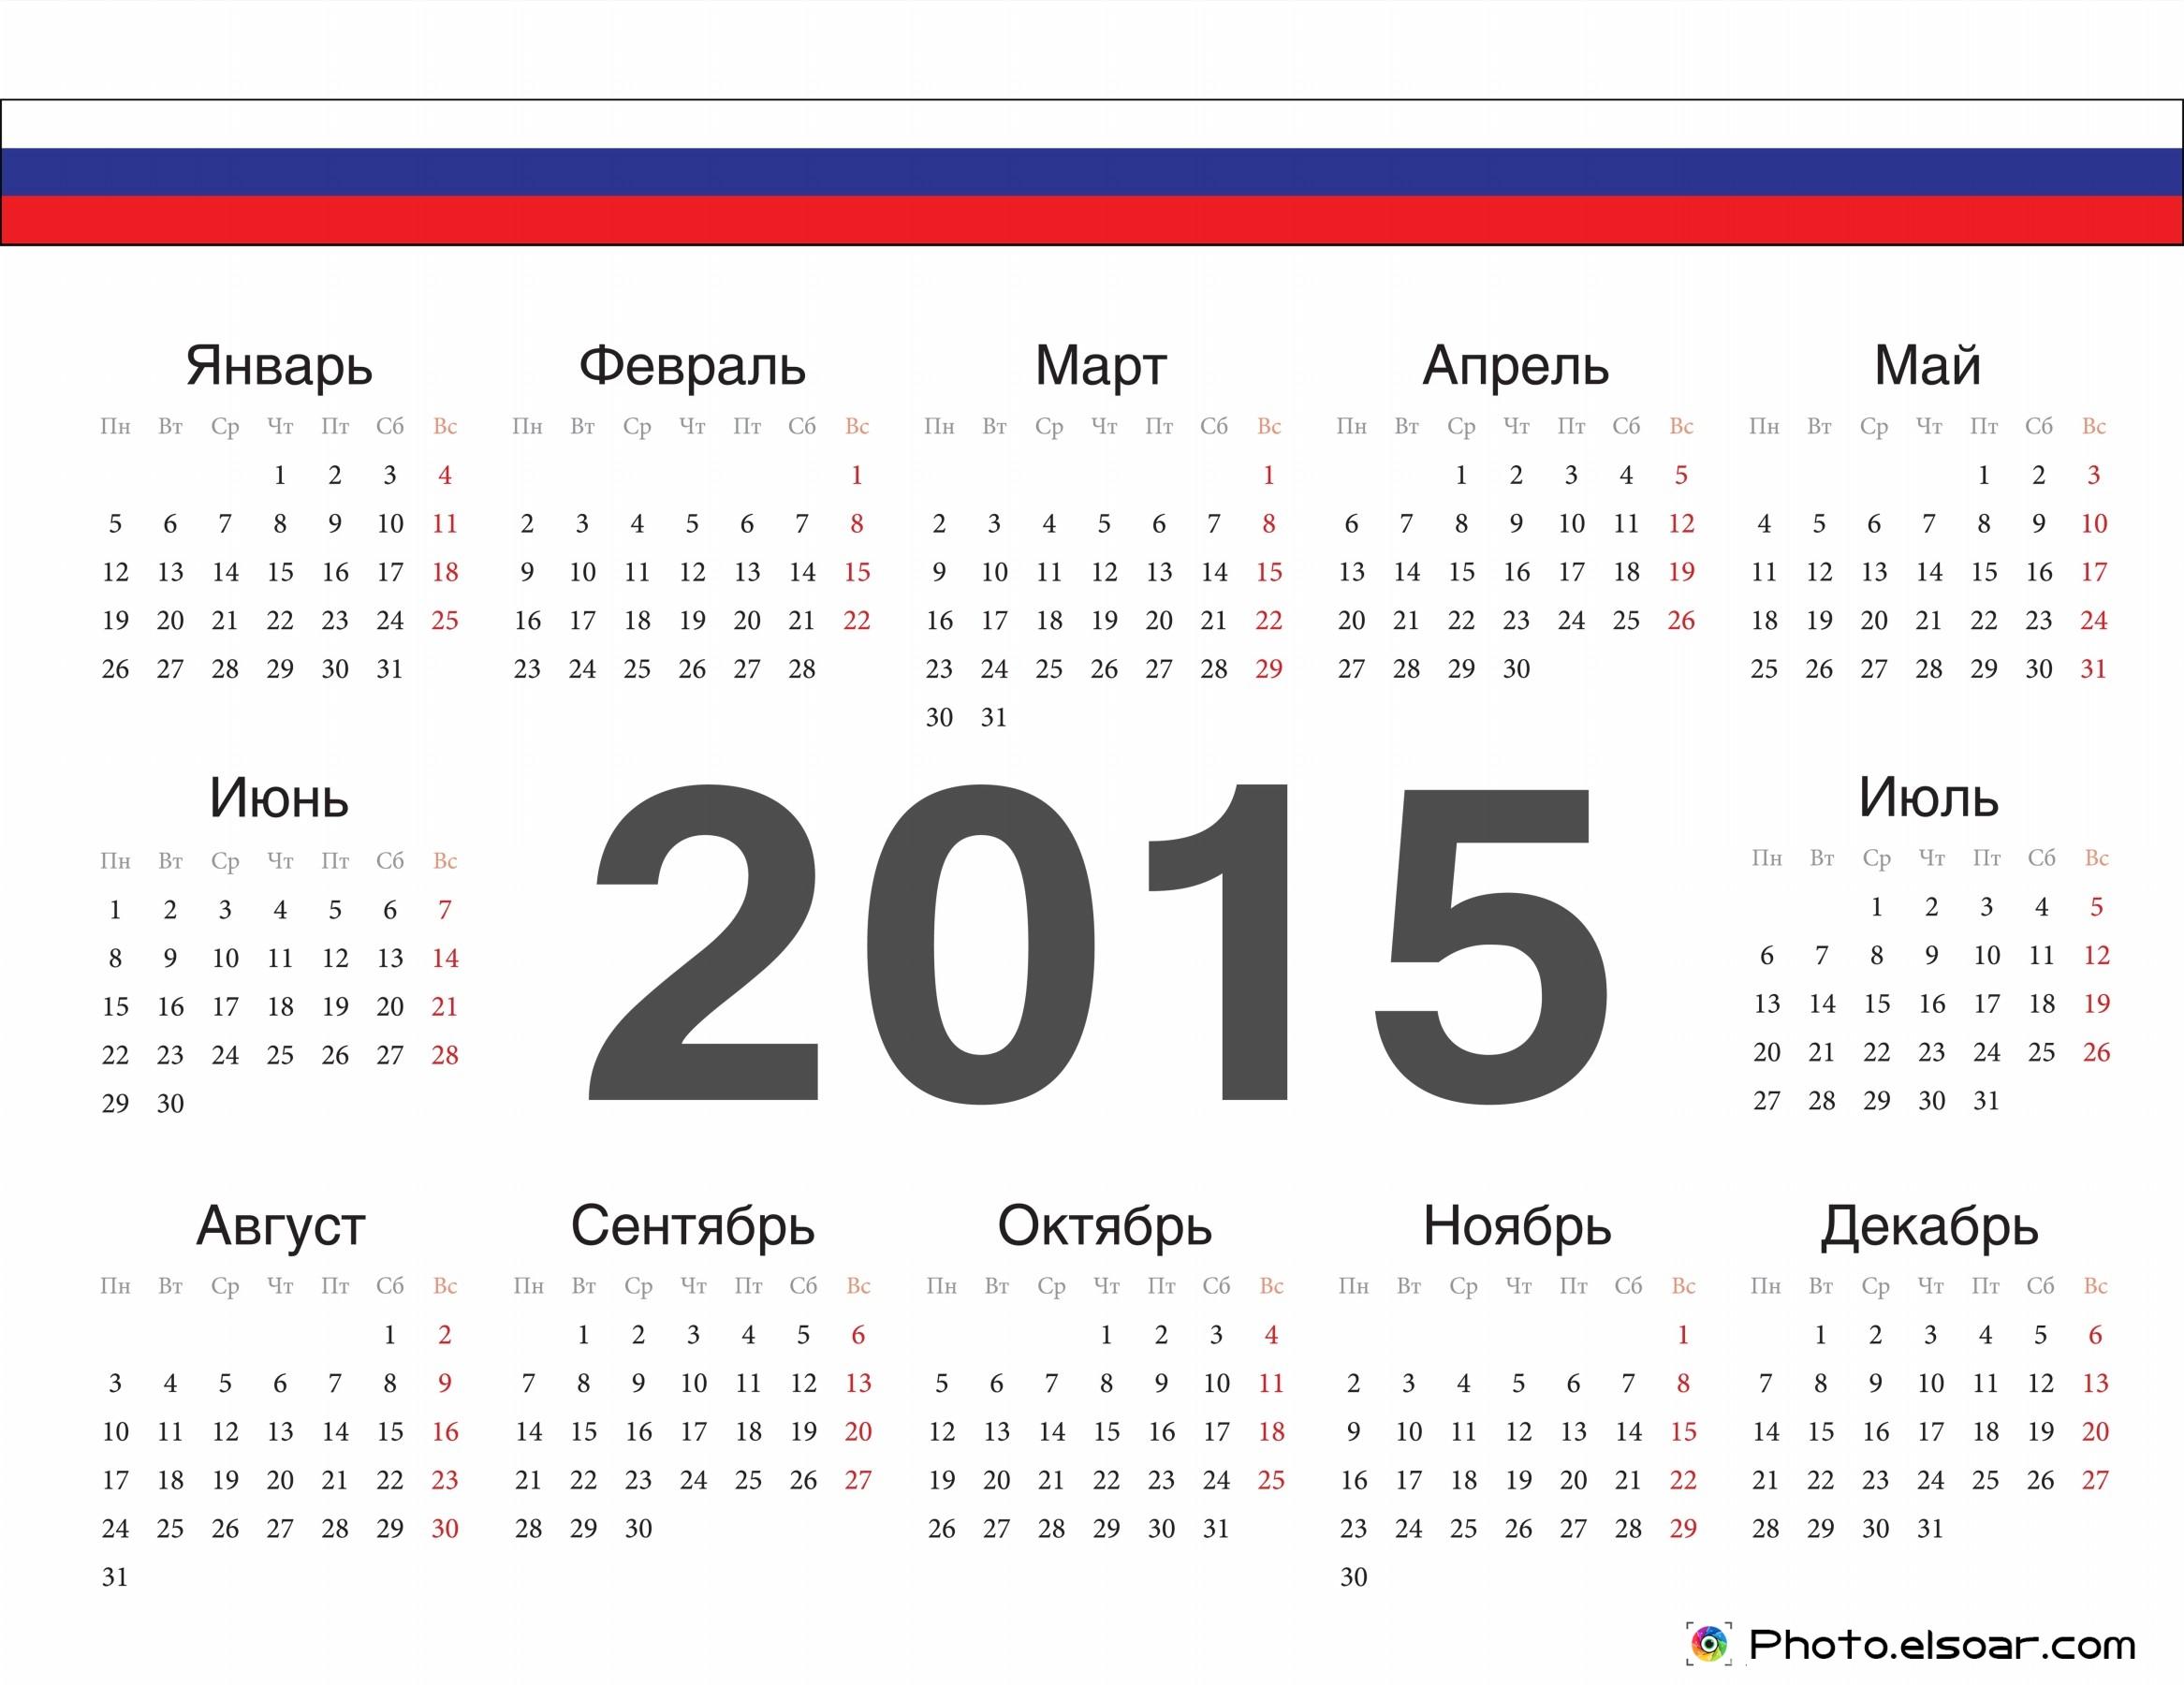 russian calendar 2015 free templates u0026 jpegs u2022 elsoar